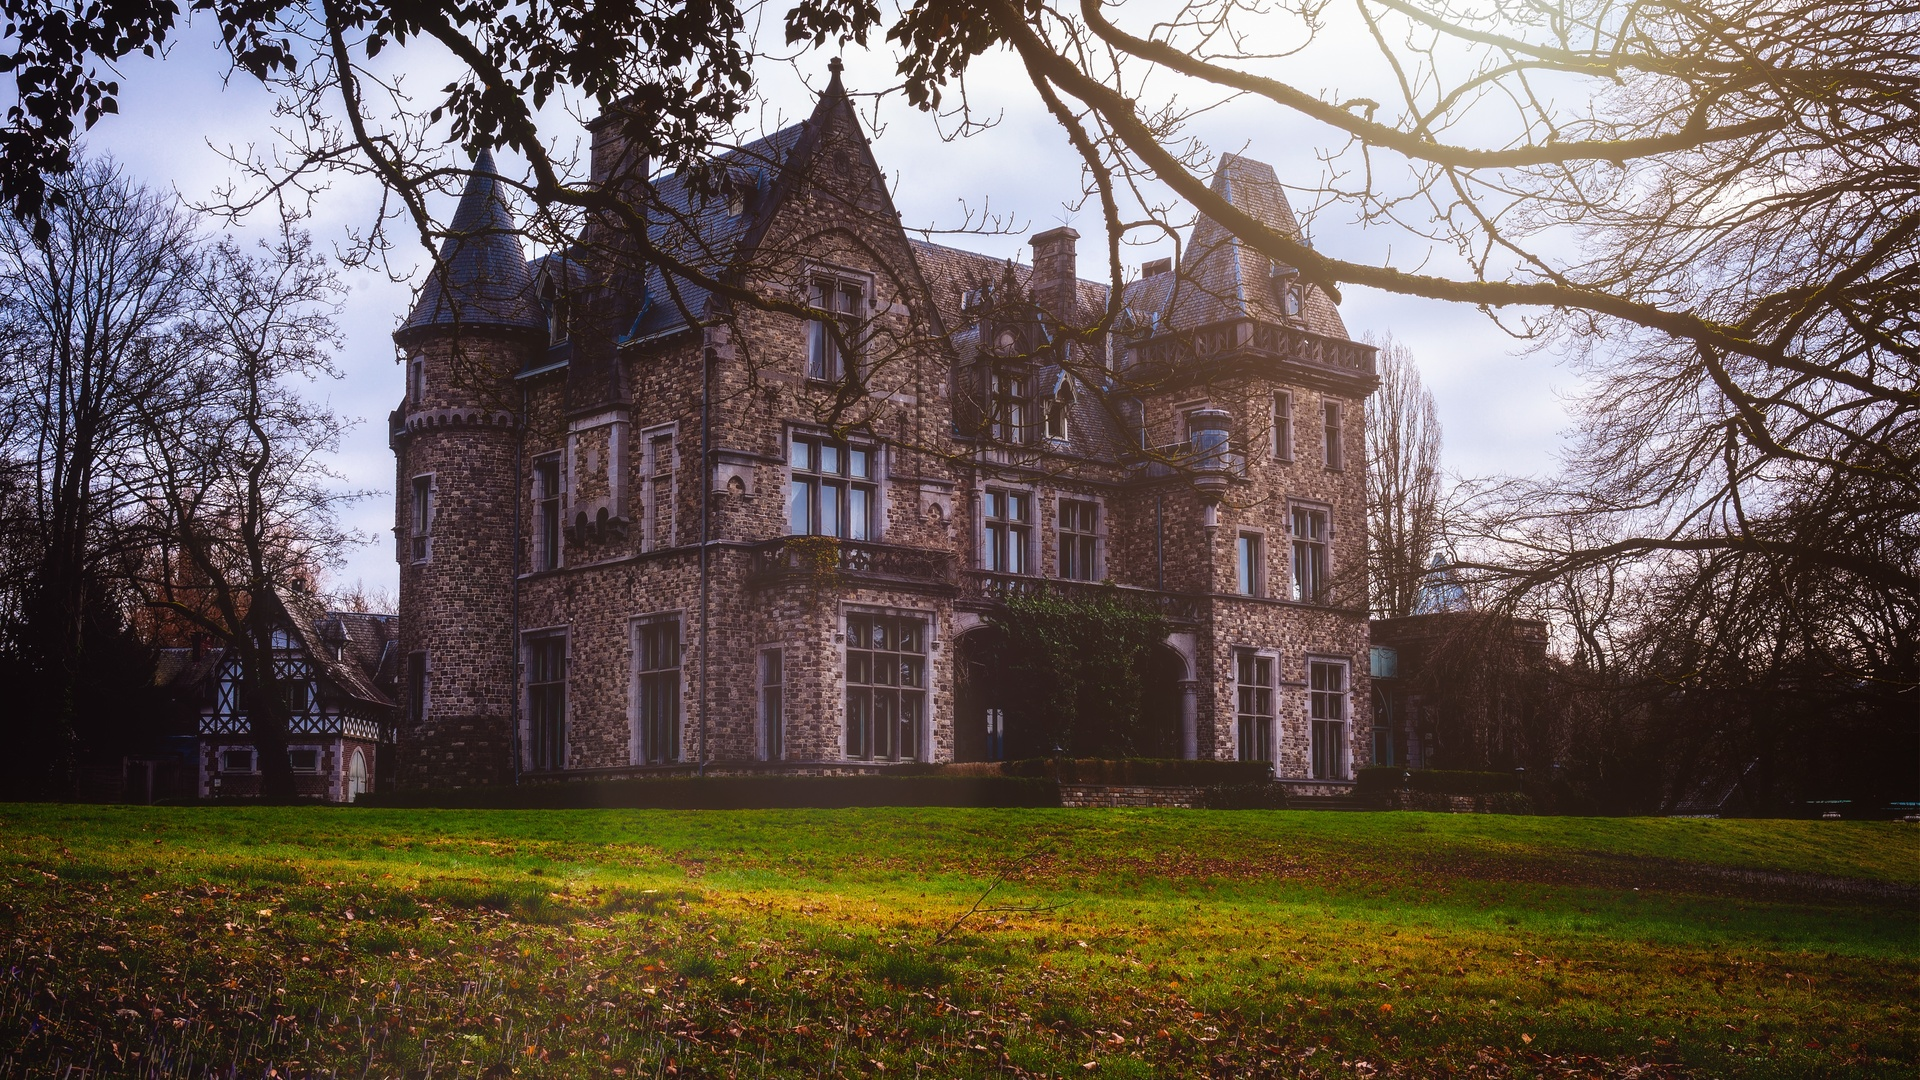 замок, шато, архитектура, парк, исторически, старый